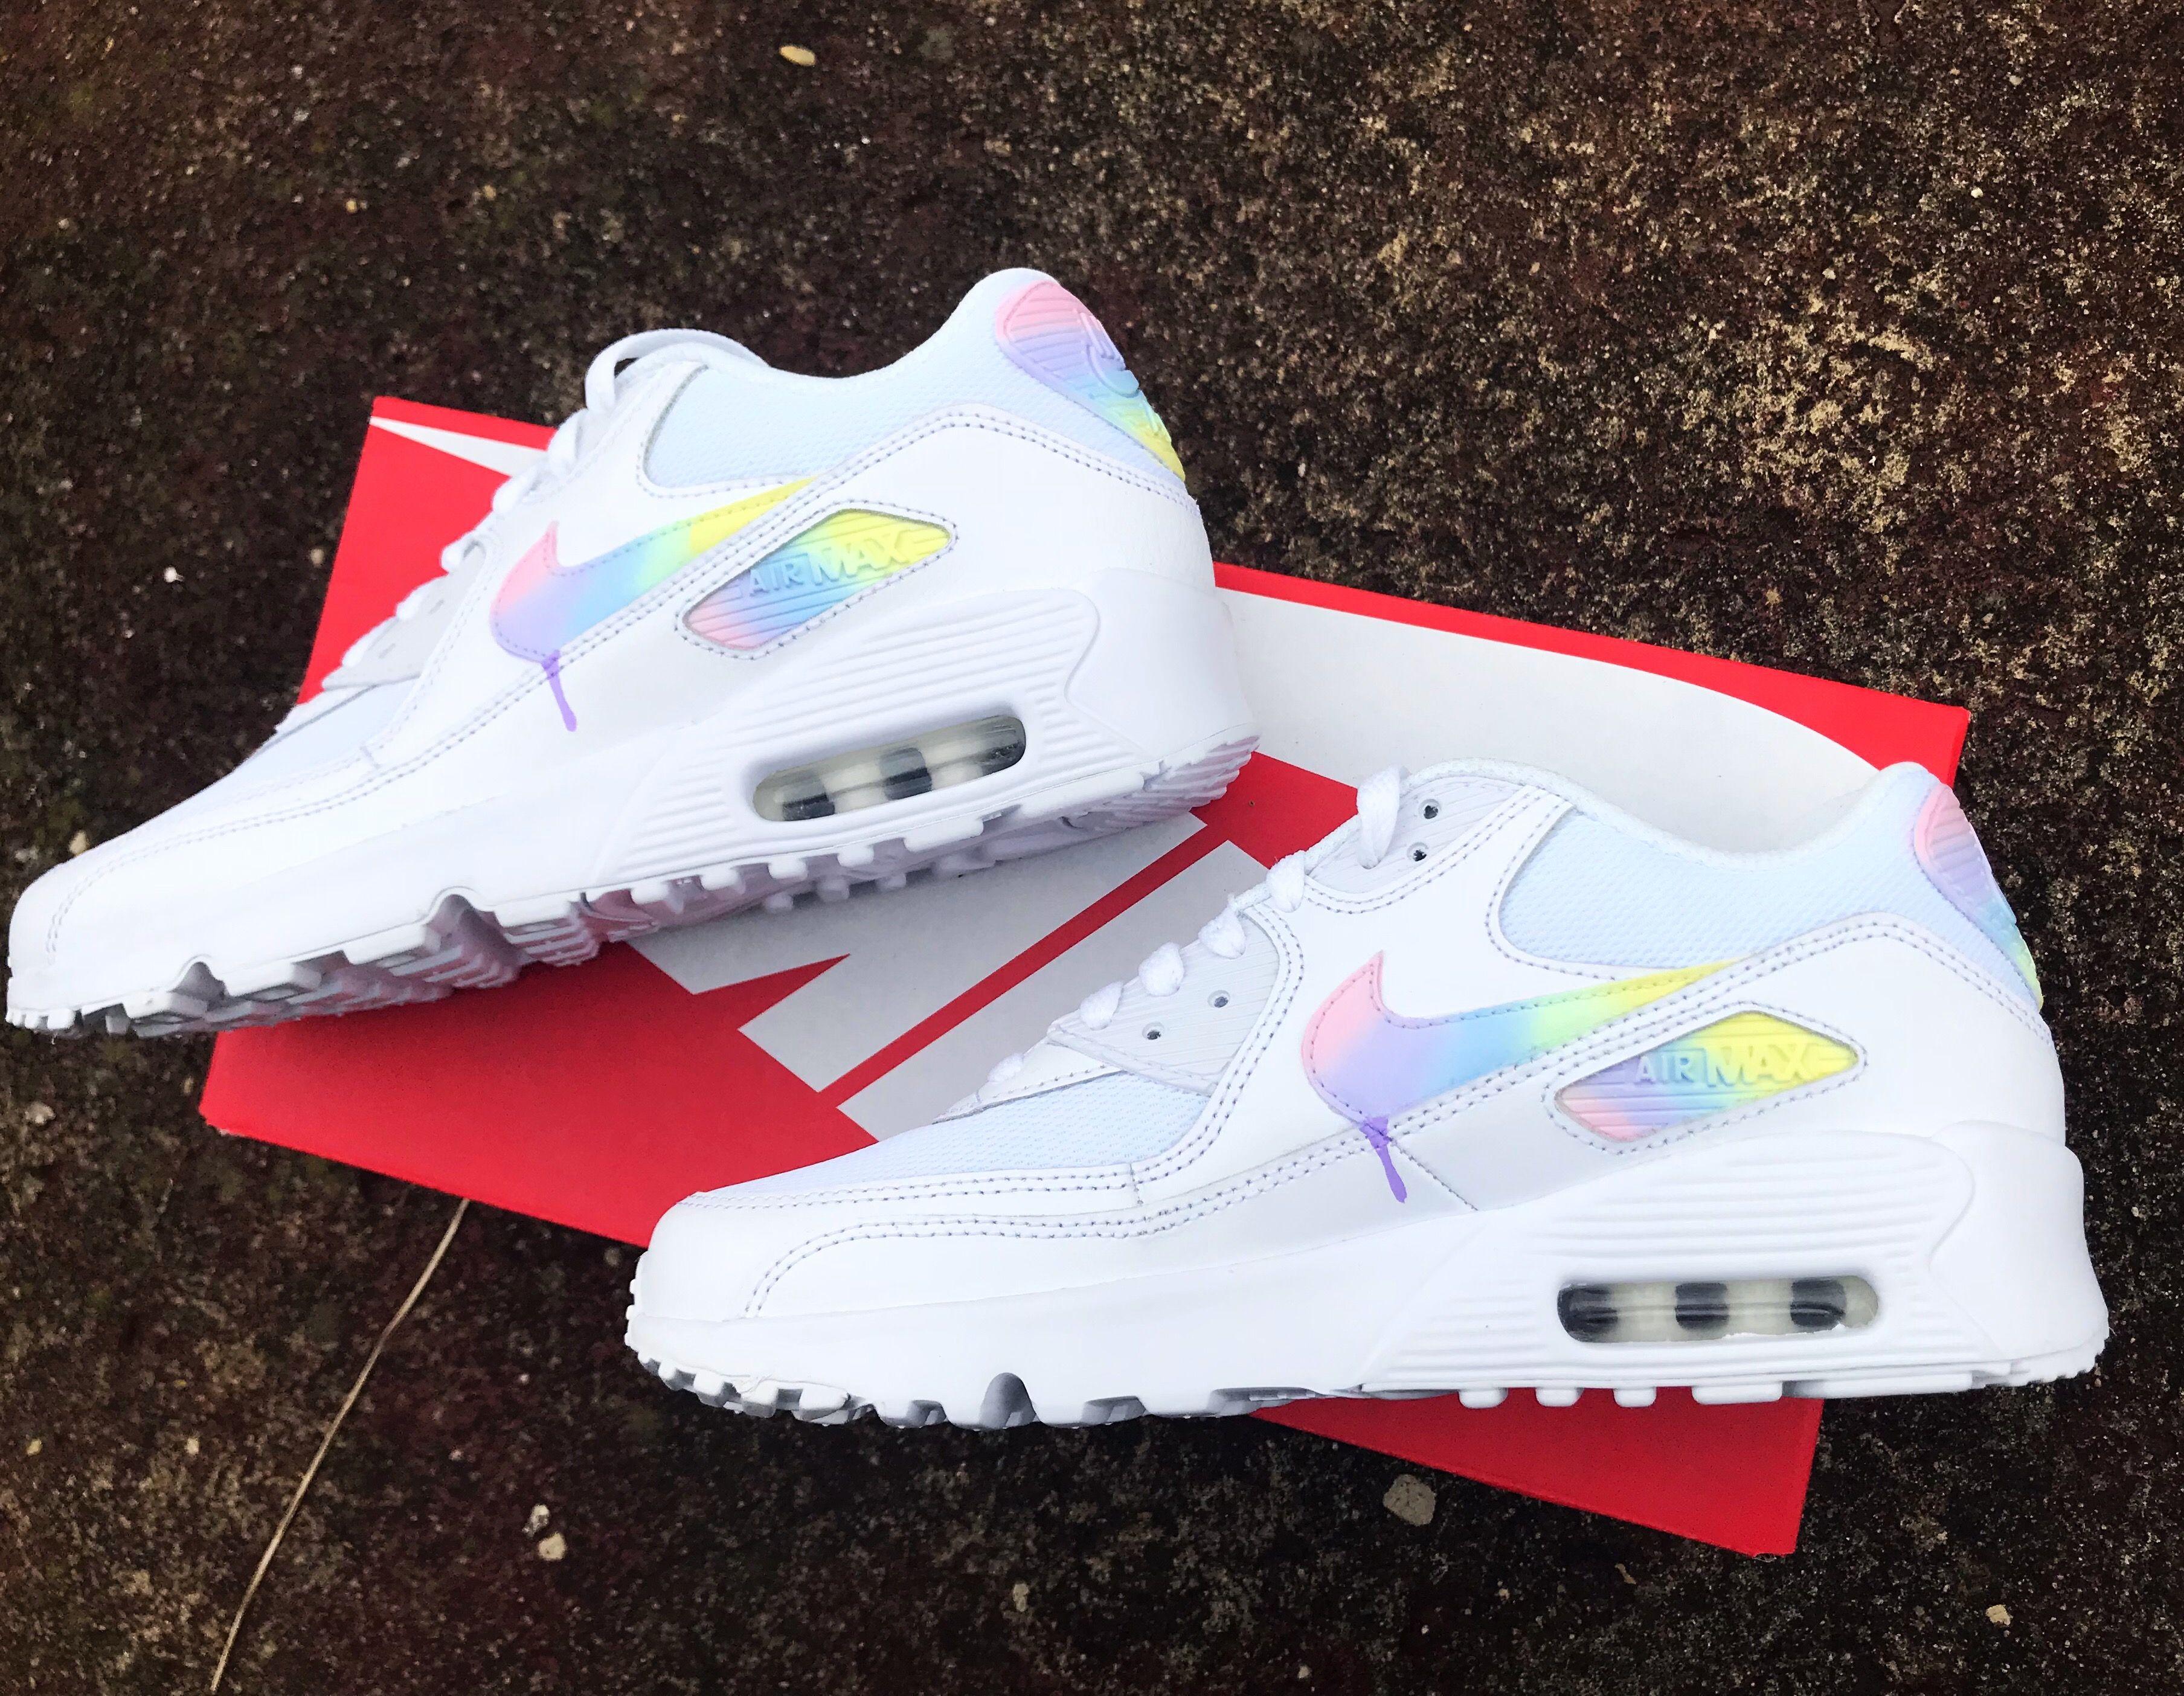 769119f7e713 Nike unicorn 🦄. Nike unicorn 🦄 Air Max 90 ...